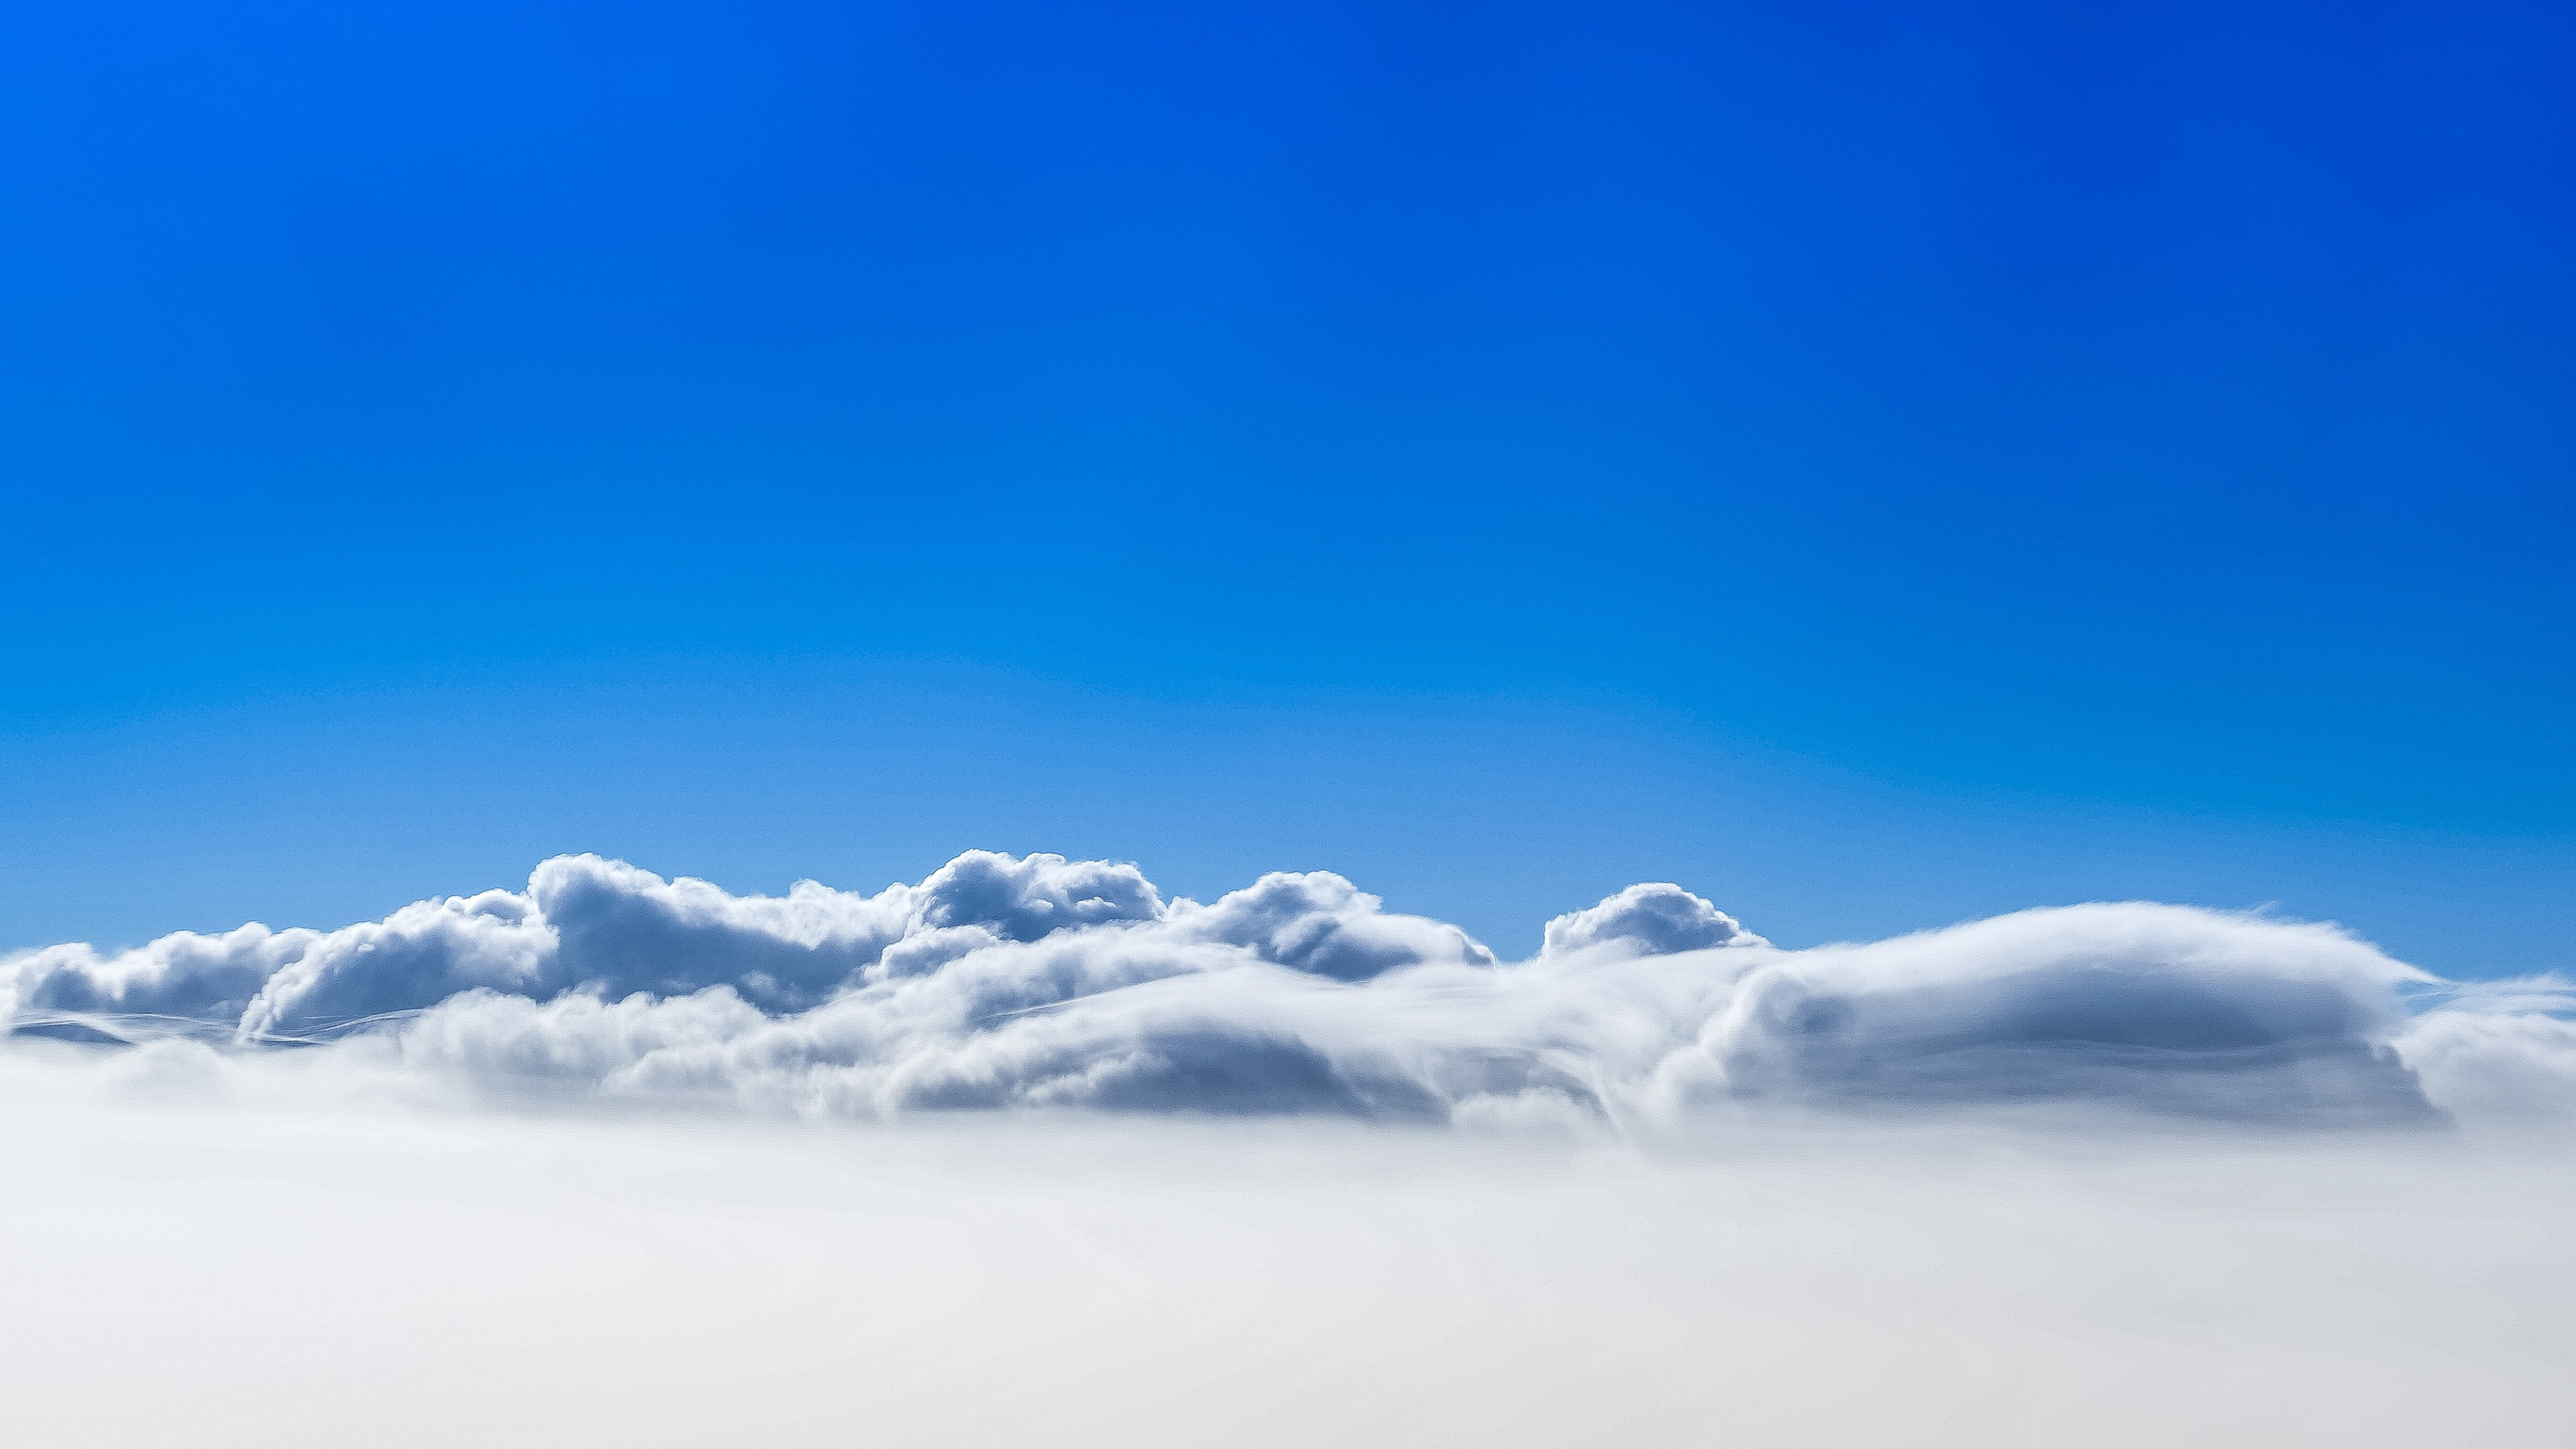 Ярко-синее небо на кучевыми серо-белыми туманными облаками